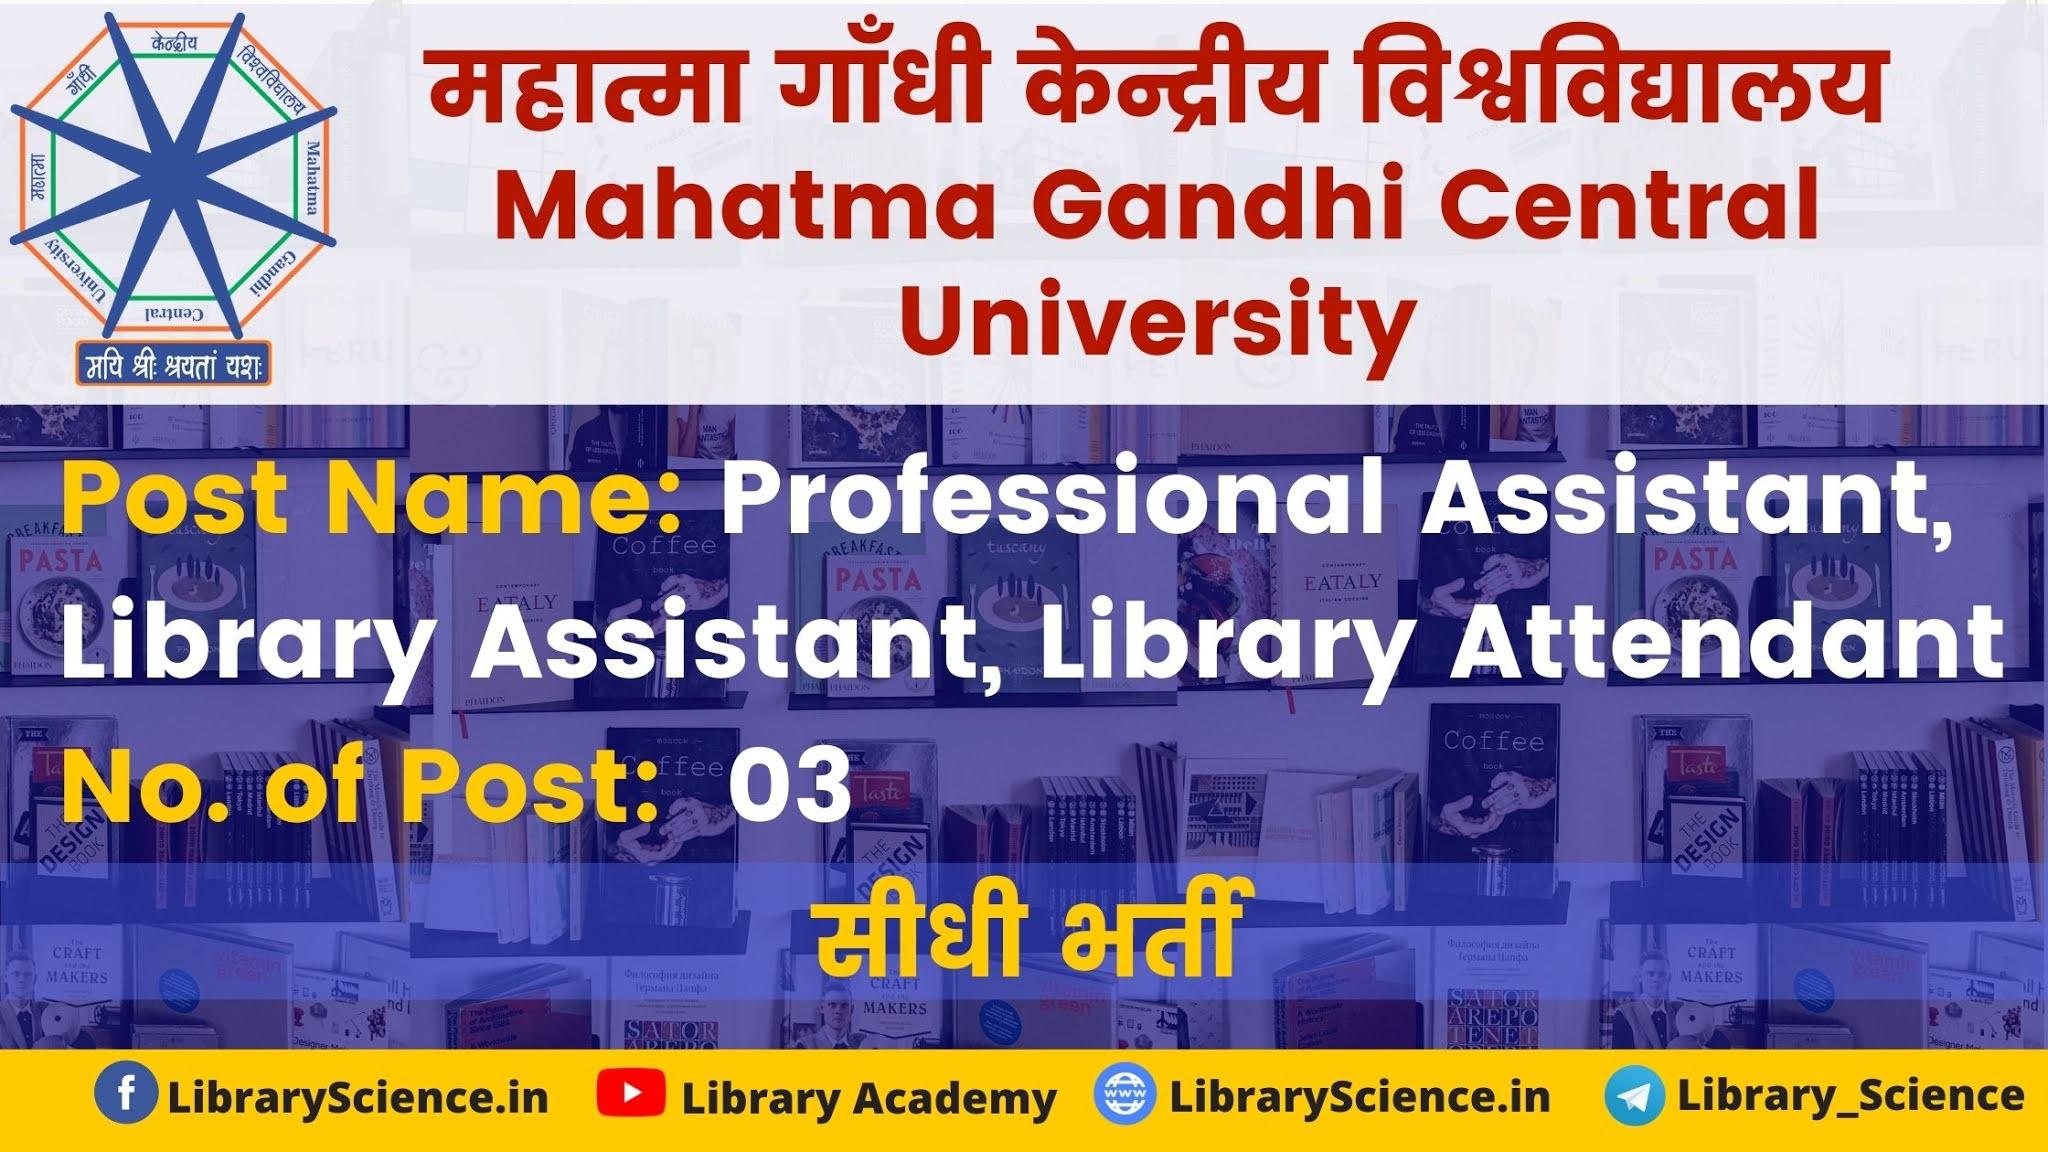 Library Vacancy 2020 at Mahatma Gandhi Central University, Motihari